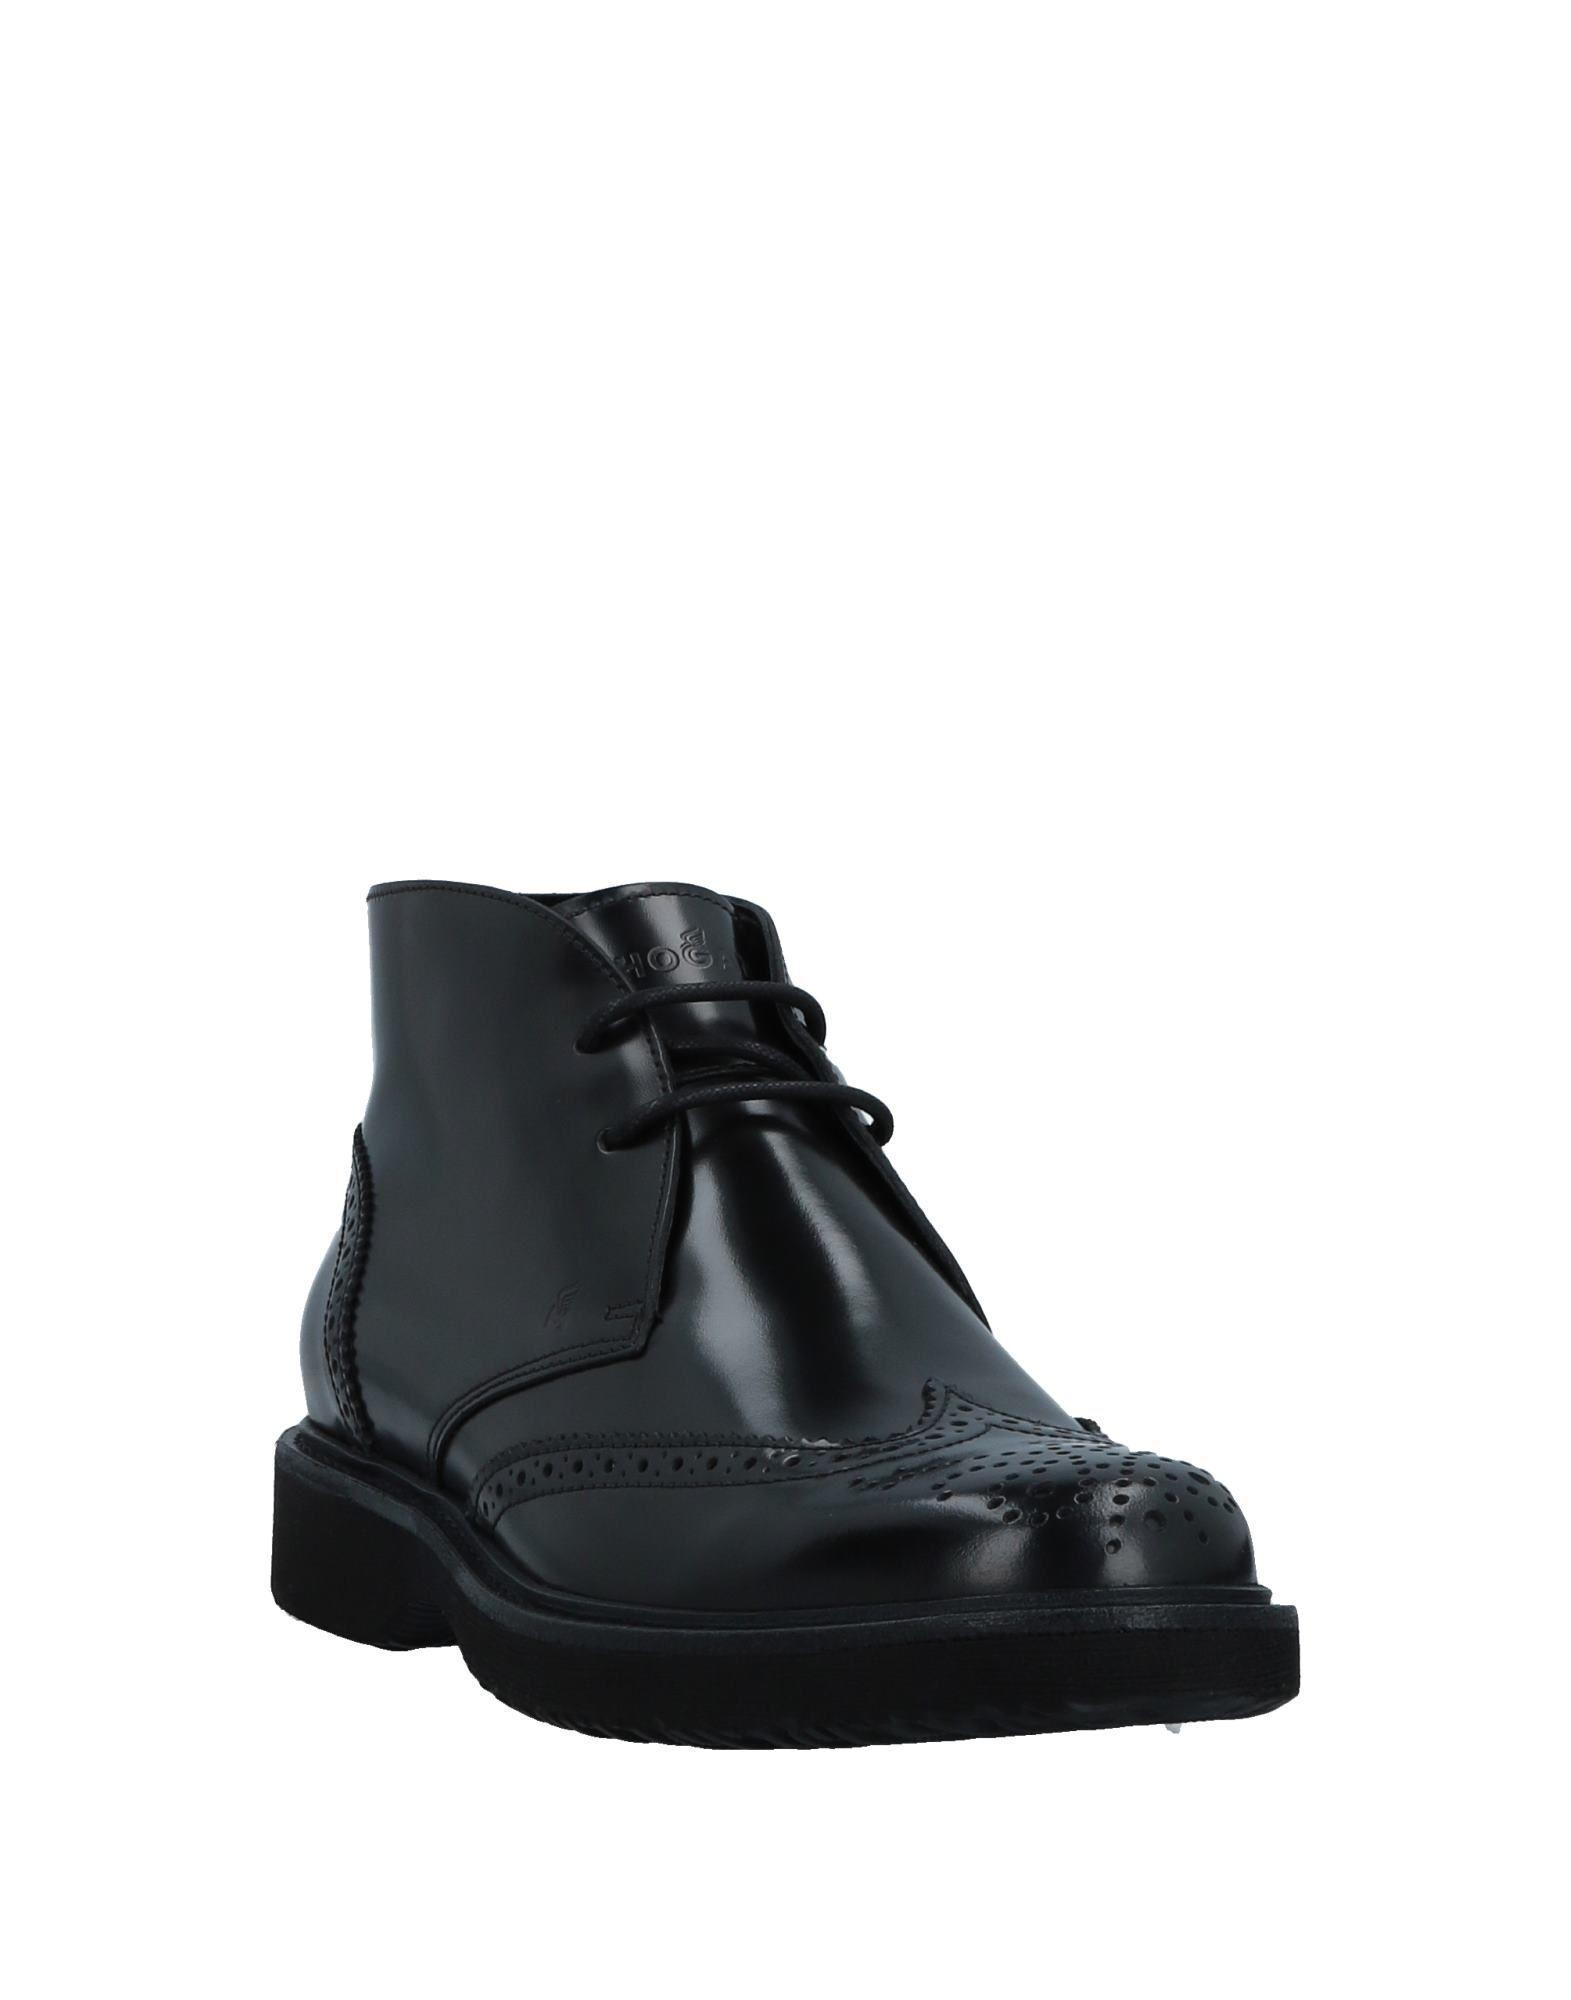 Hogan Black Leather Lace Up Boots